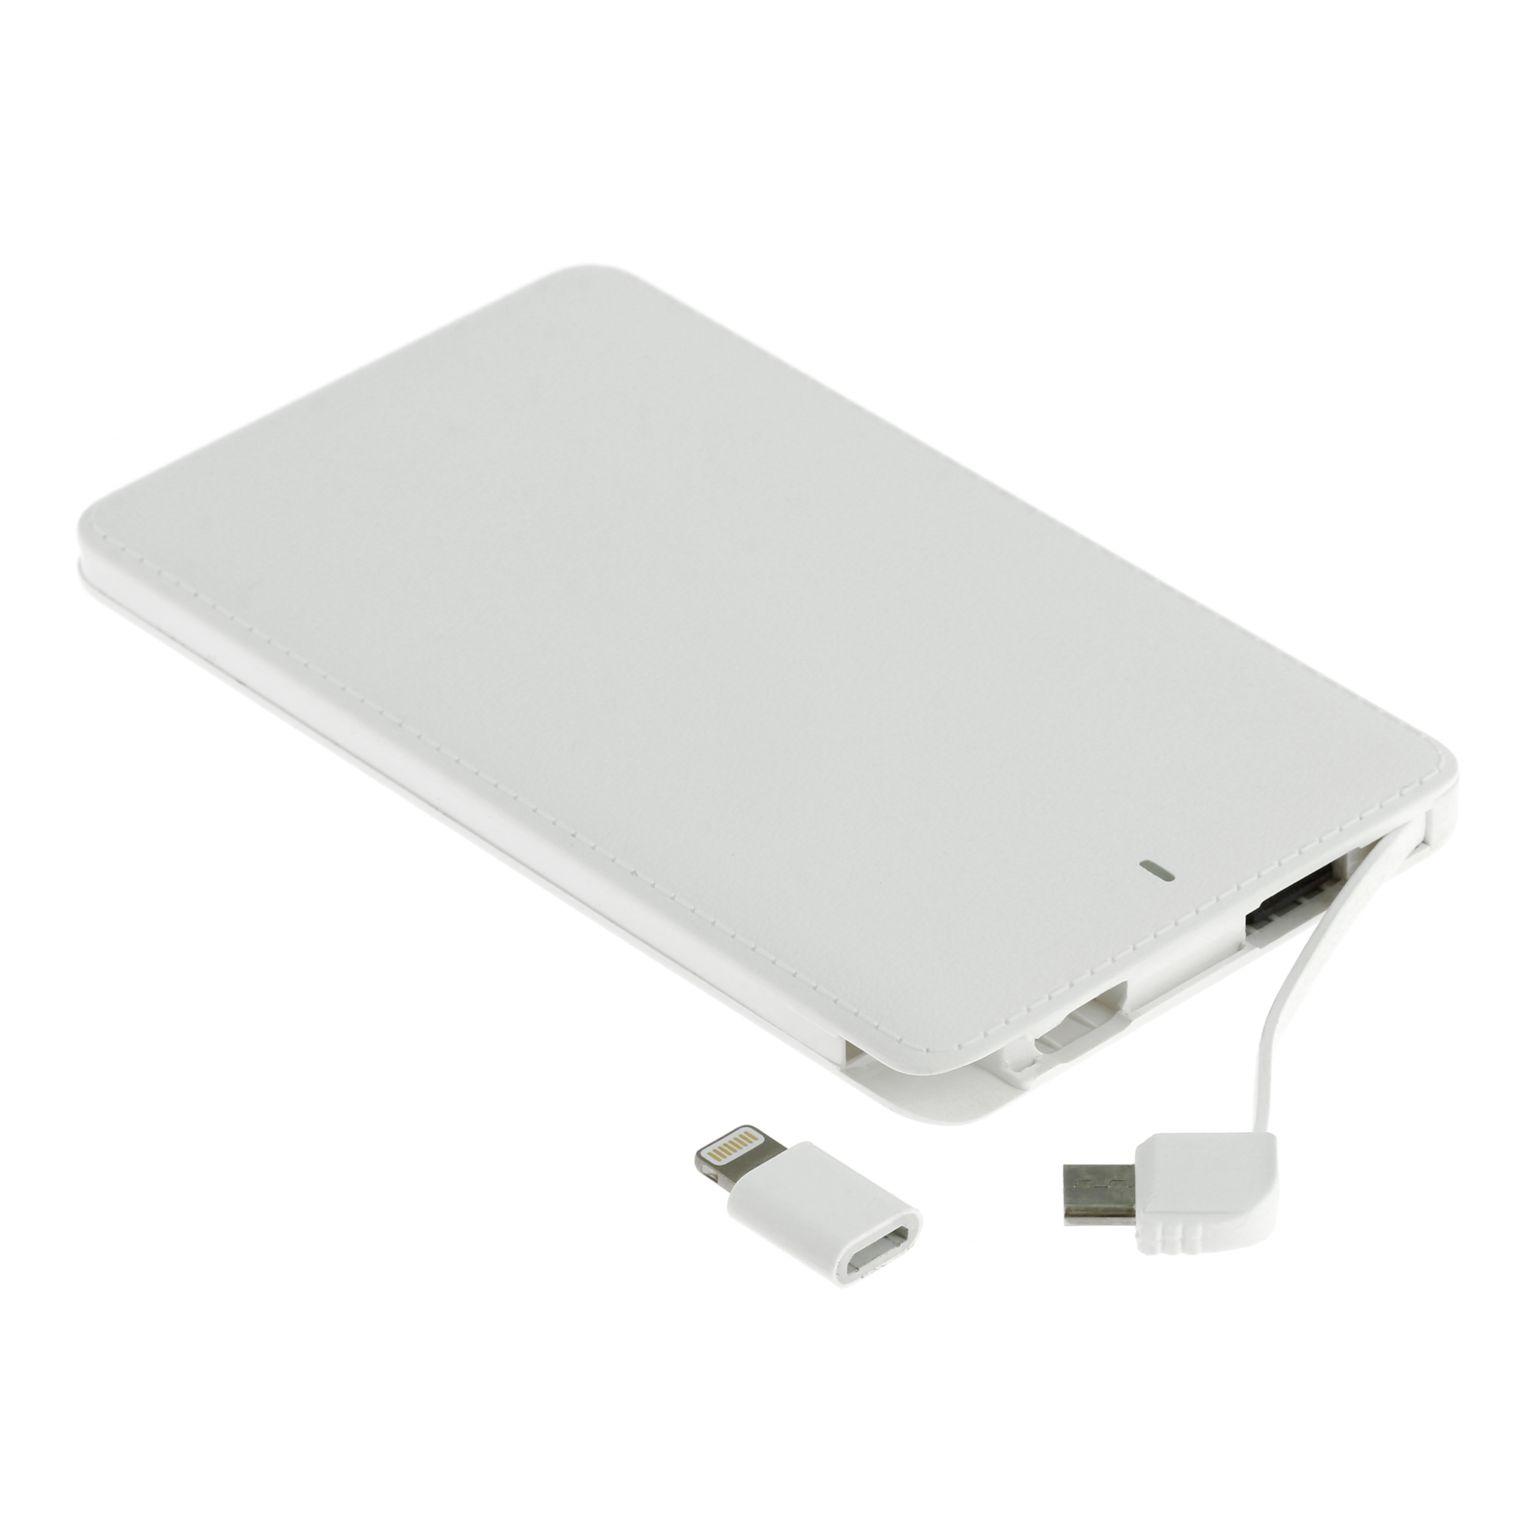 T'nB® | Batterie externe ultra plate 4000mAh